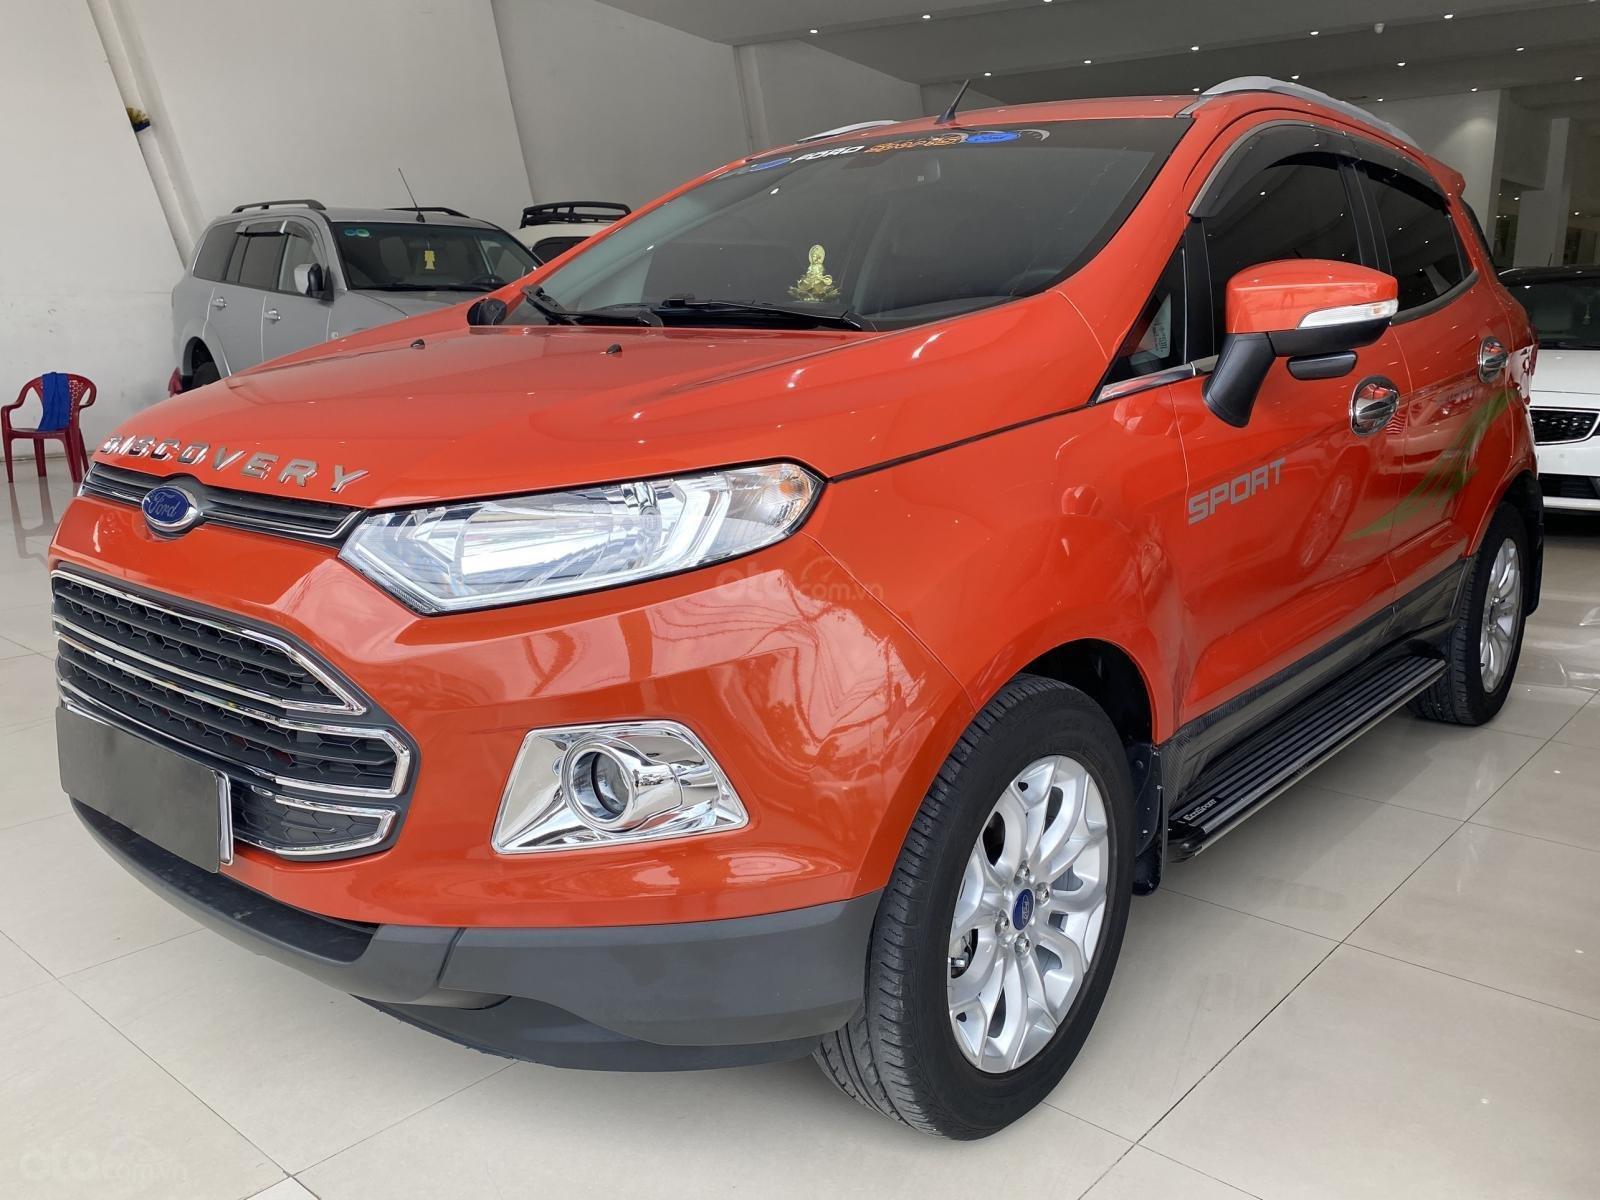 Cần bán Ford Ecosport 1.5 Titanium mẫu mới 2018 (3)